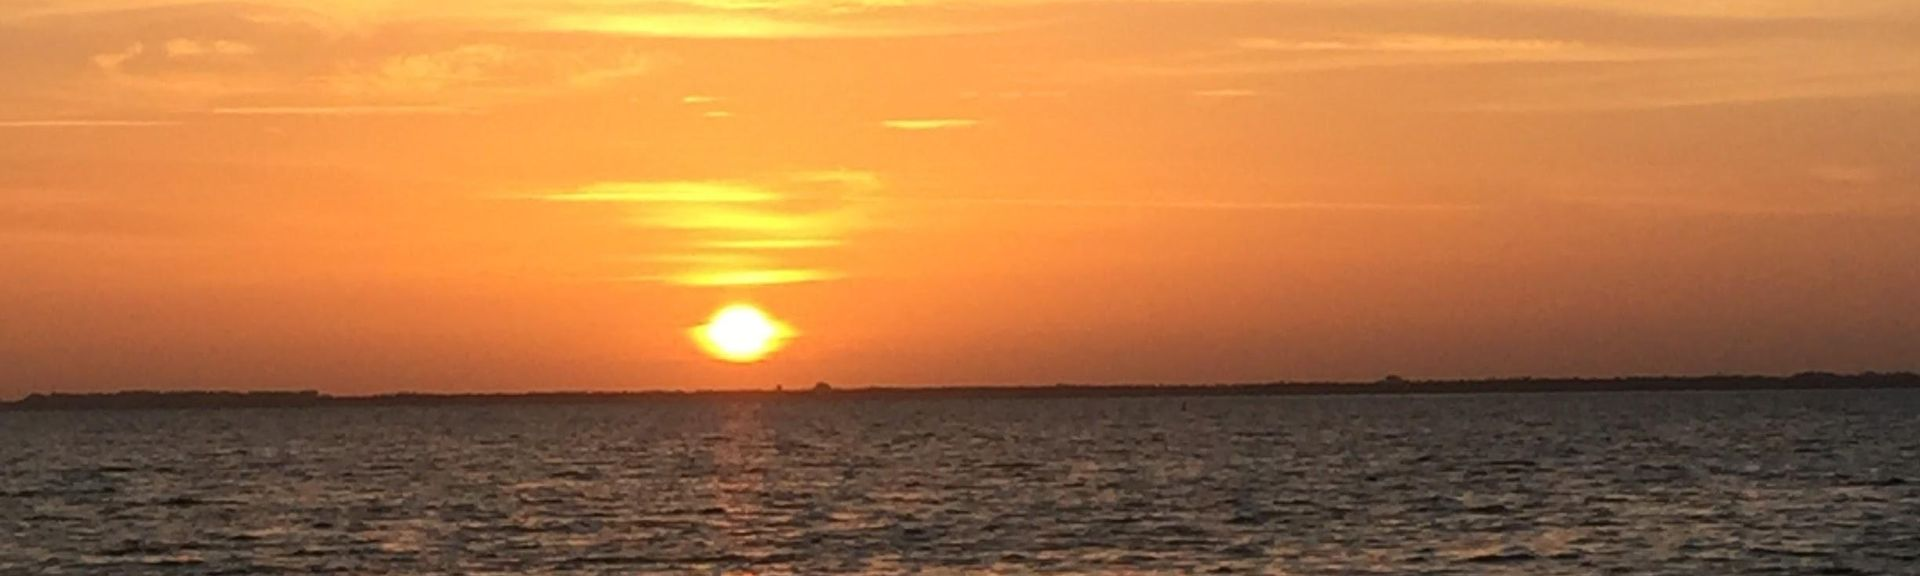 Loggerhead Cay (Sanibel Island, Florida, United States)